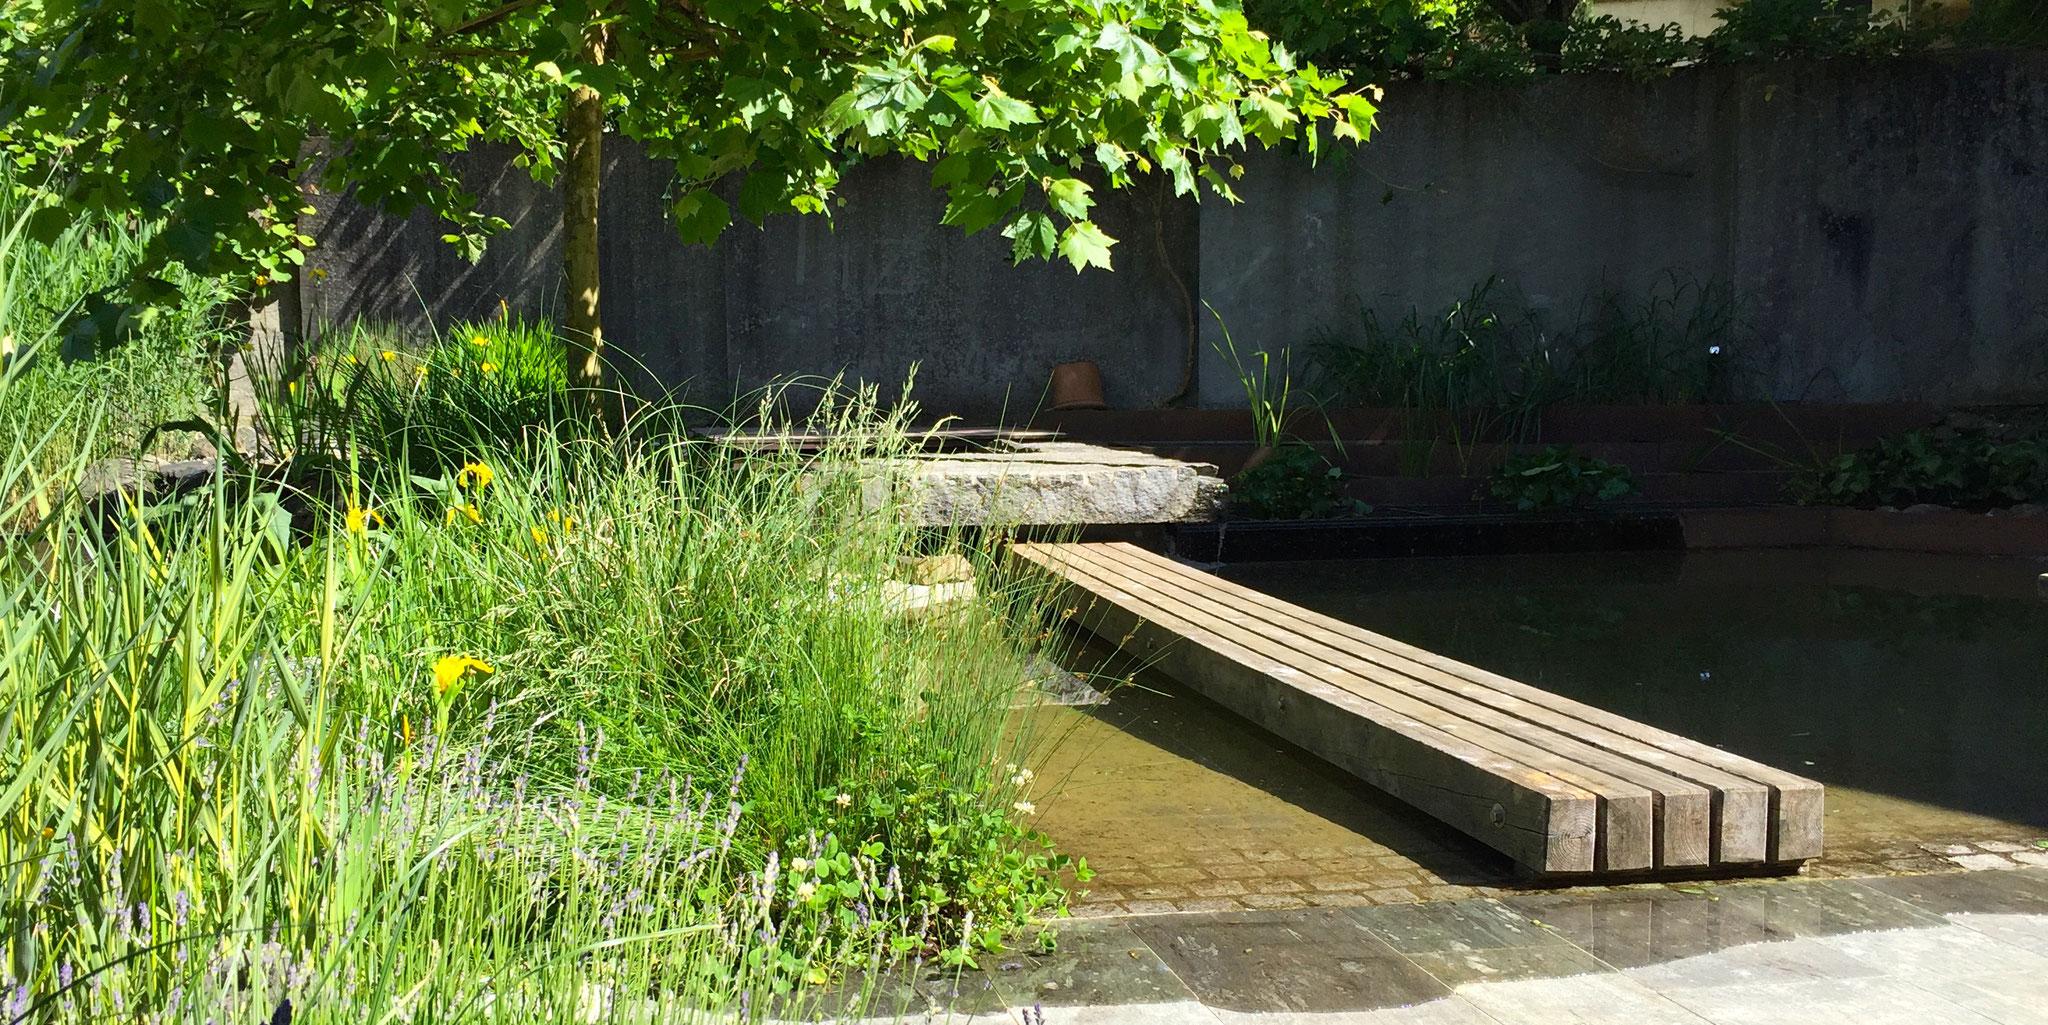 Wasserrinne mit Brücke in Zollikon